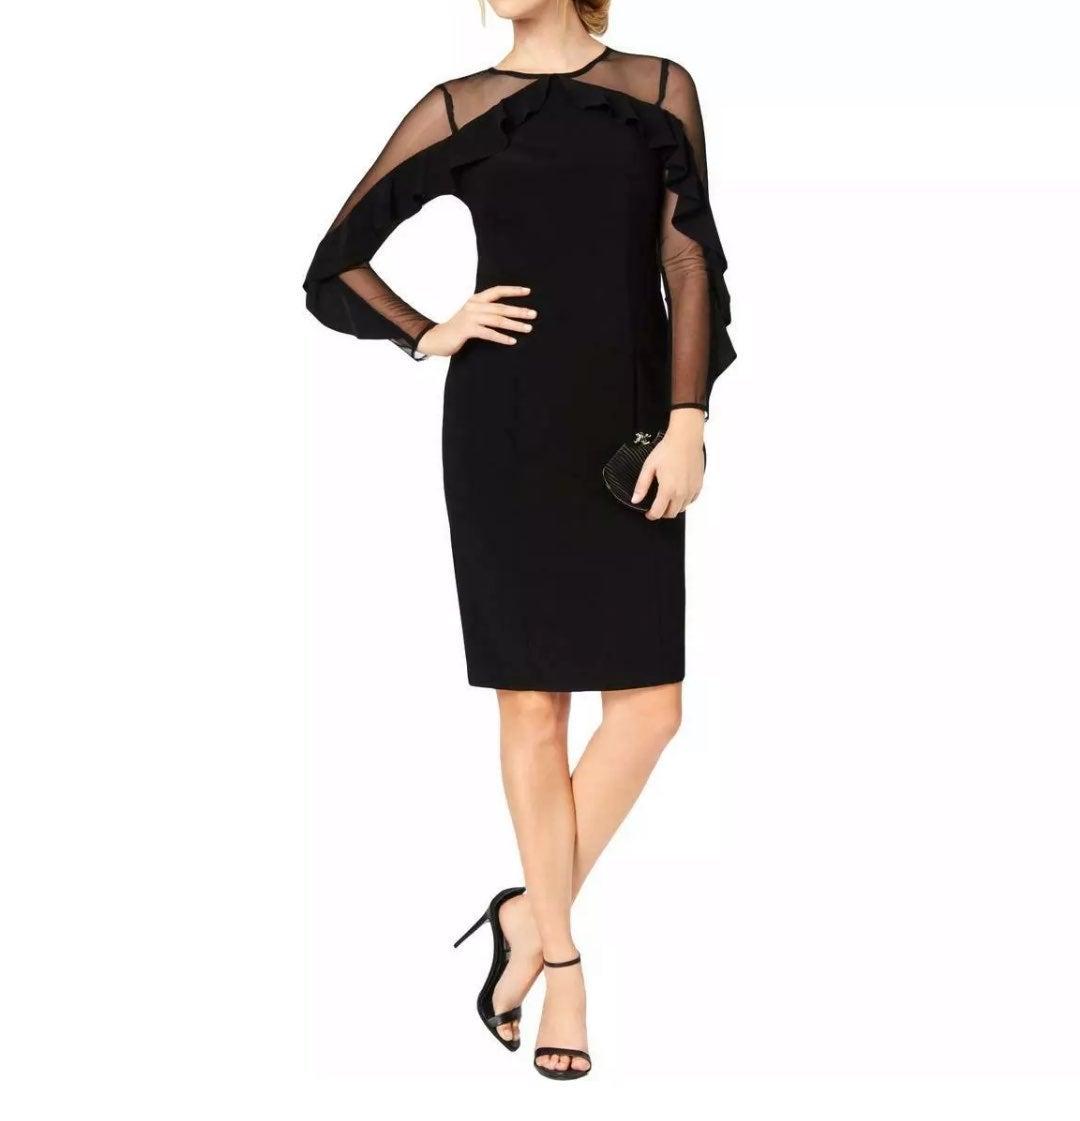 R&M Richards Black Evening Sheath Dress